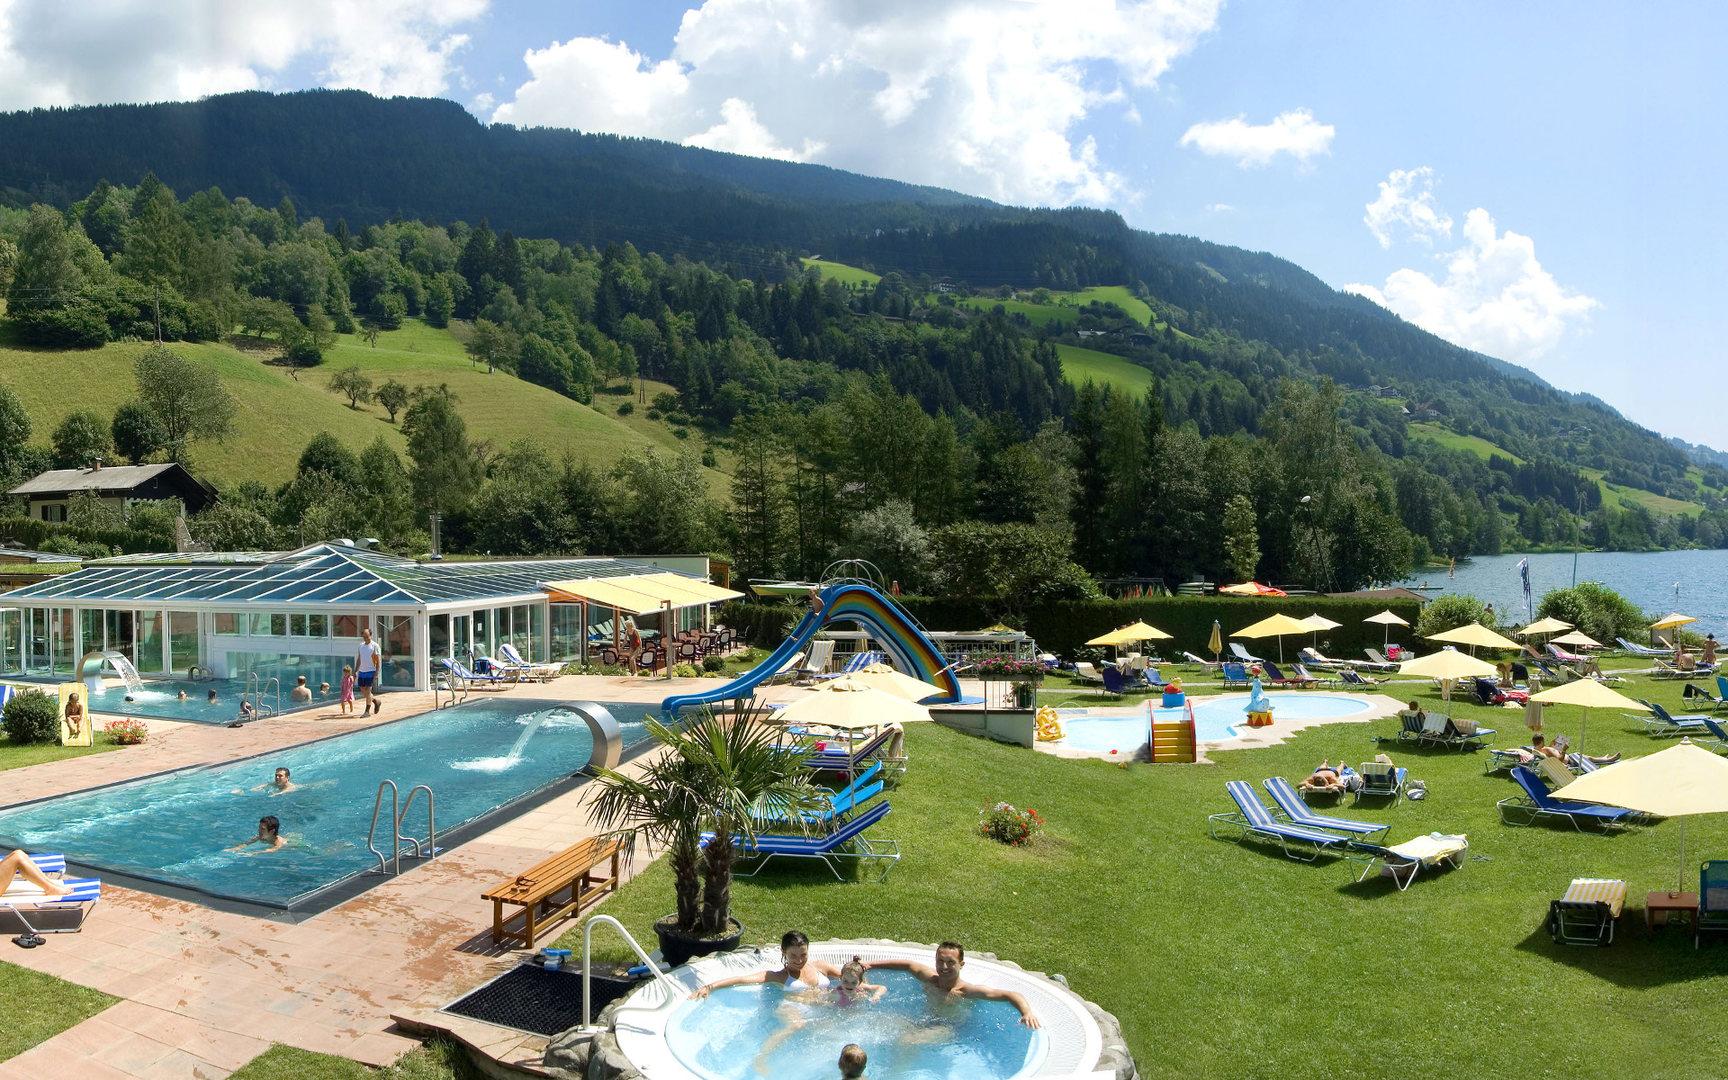 brennseehof-schwimmbad-pan-3-2